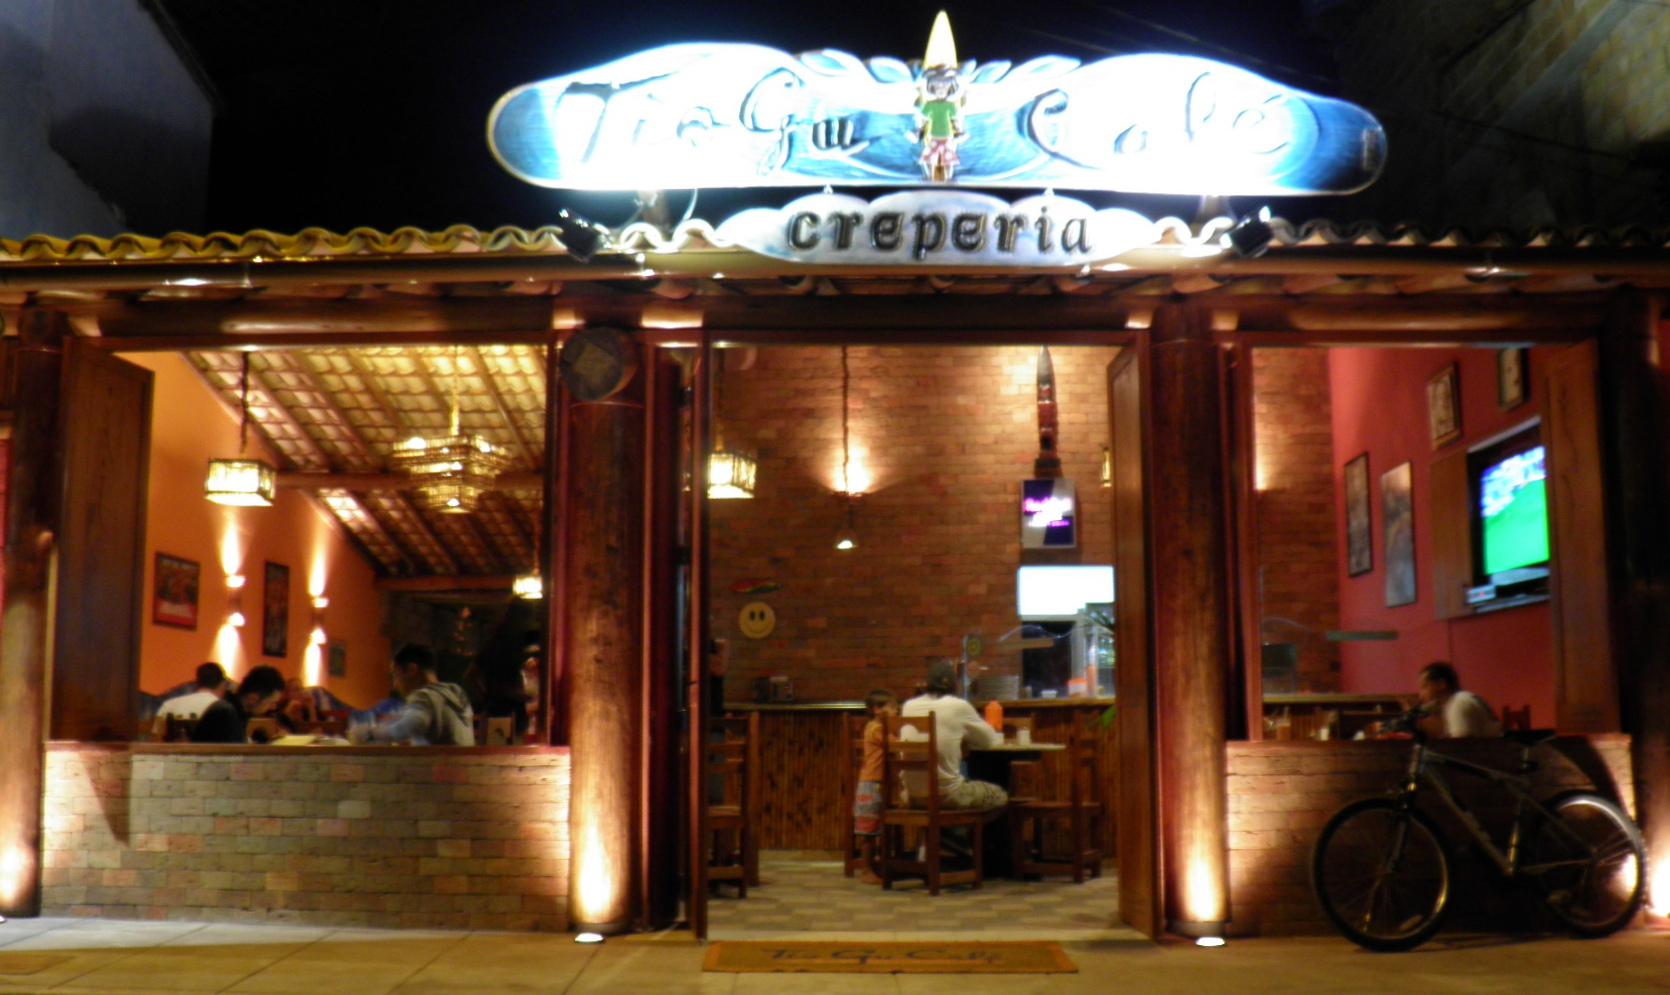 Tio Gu Café Creperia